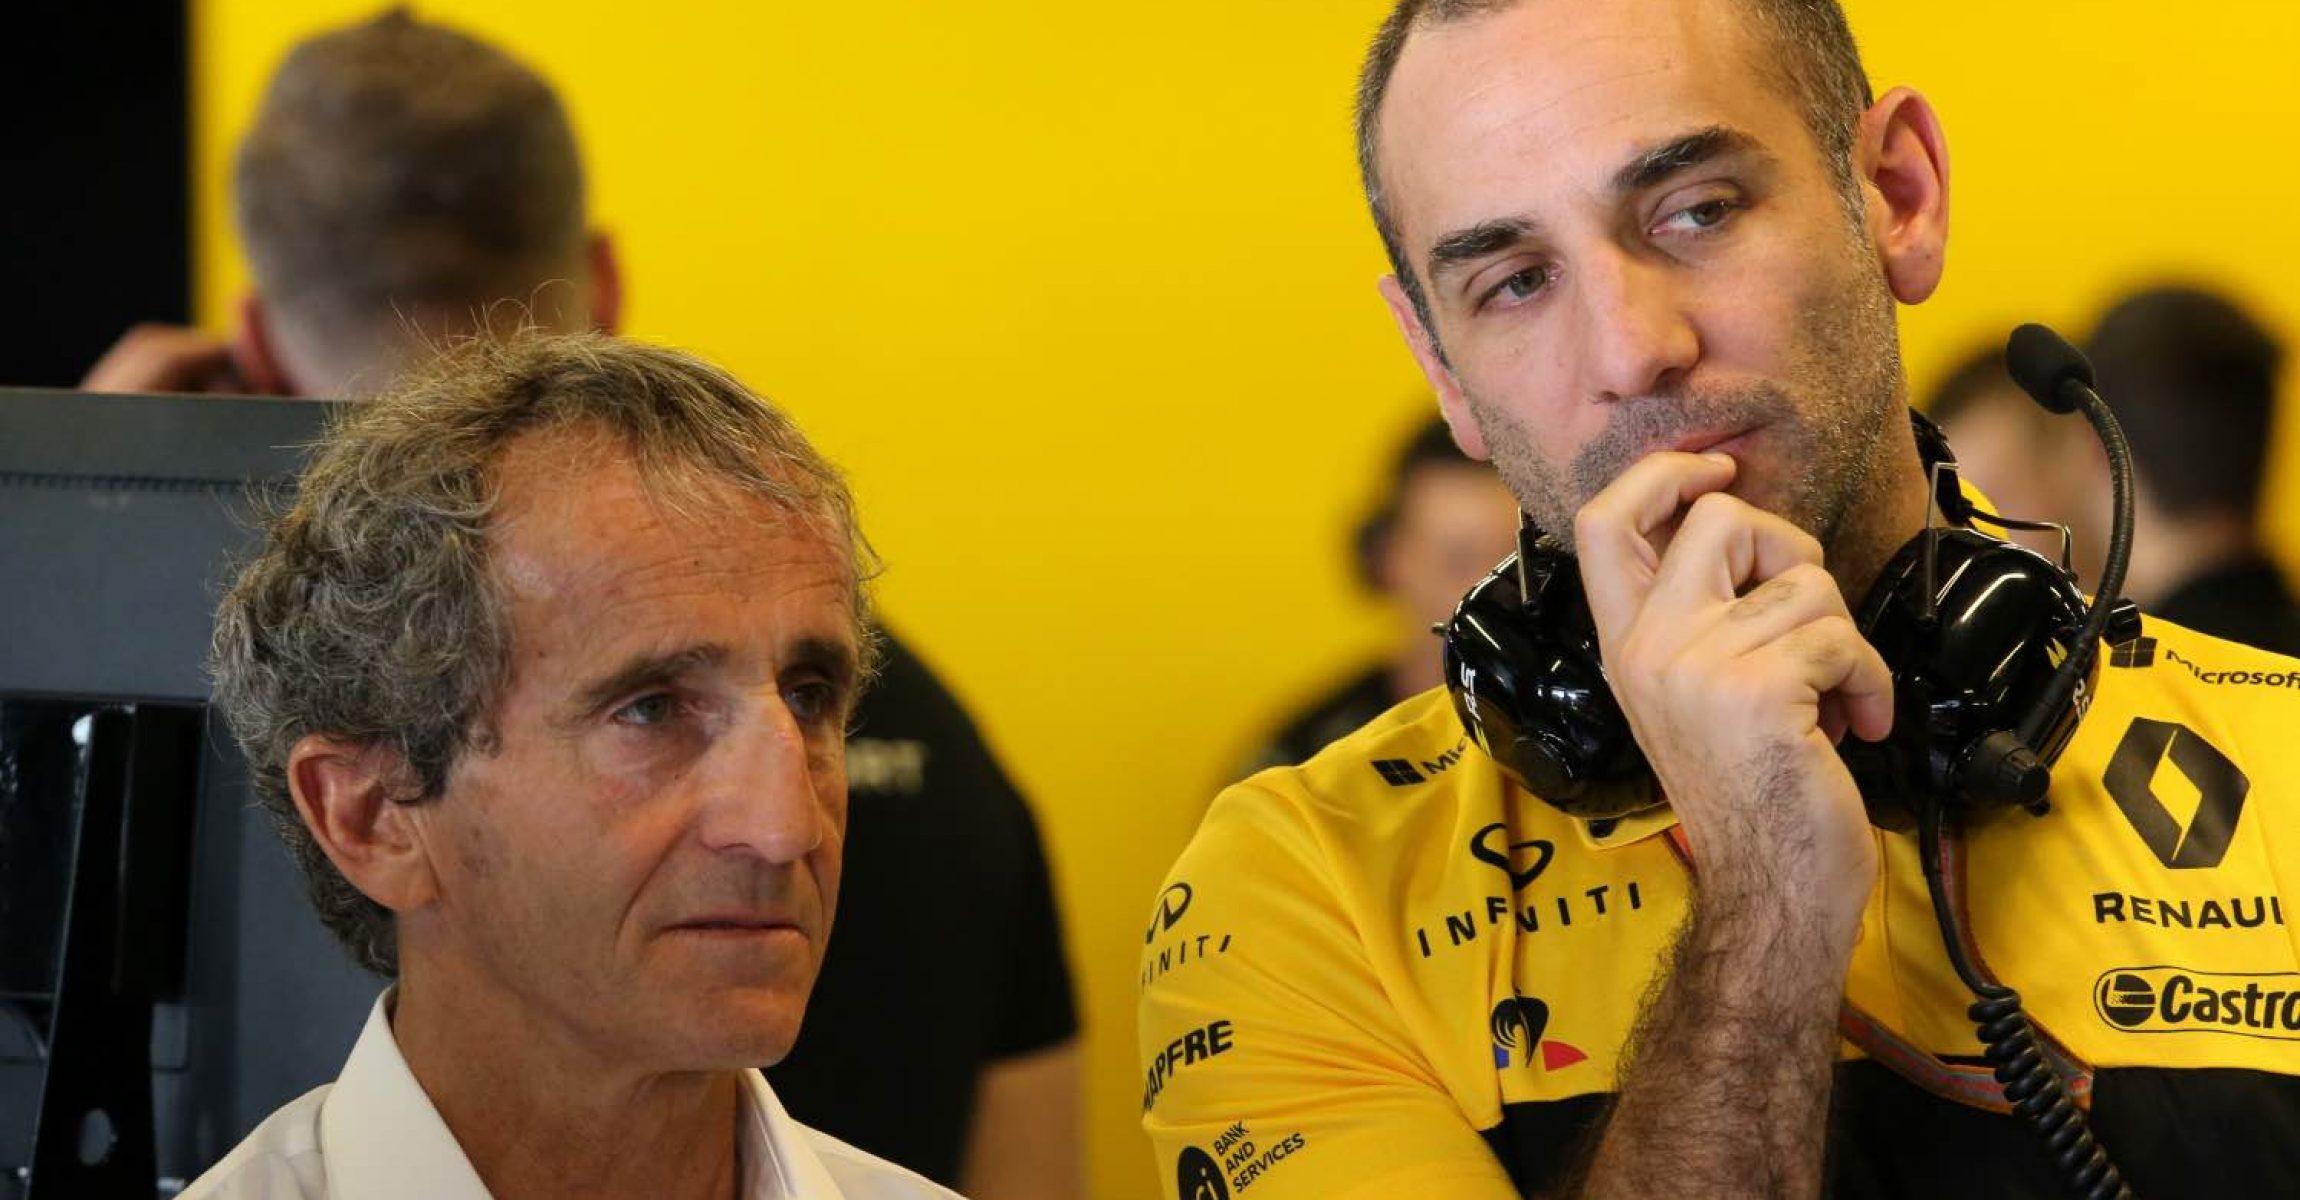 (L to R): Alain Prost (FRA) Renault Sport F1 Team Special Advisor with Cyril Abiteboul (FRA) Renault Sport F1 Managing Director. Abu Dhabi Grand Prix, Saturday 24th November 2018. Yas Marina Circuit, Abu Dhabi, UAE.